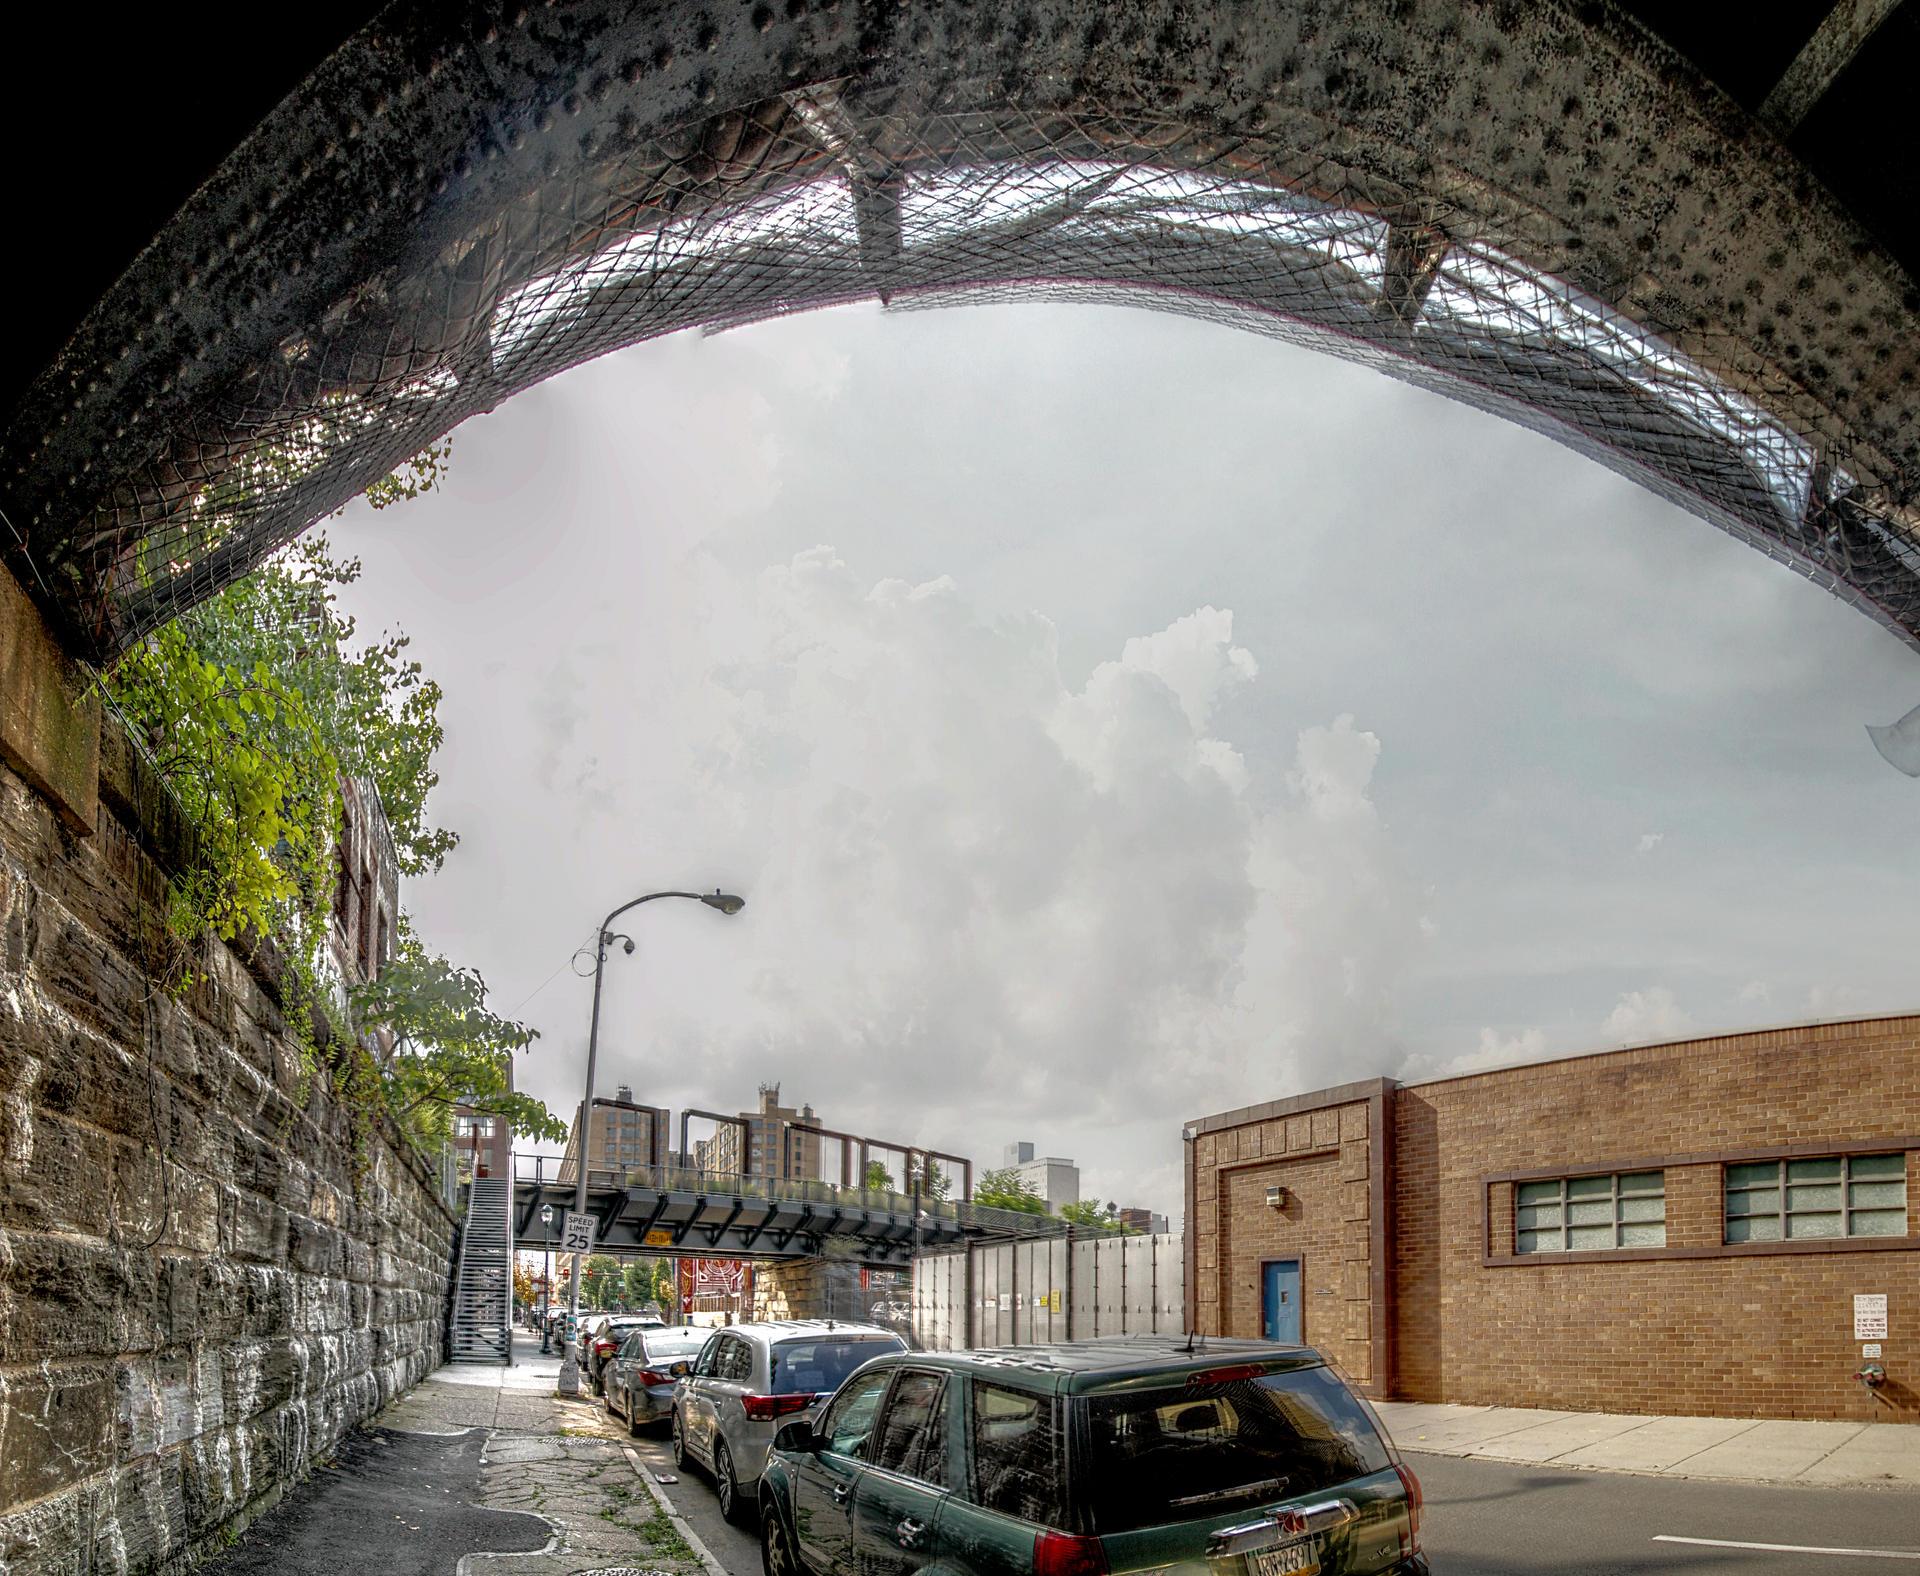 Panorama 4164 blended fused pregamma 1 mantiuk06 c